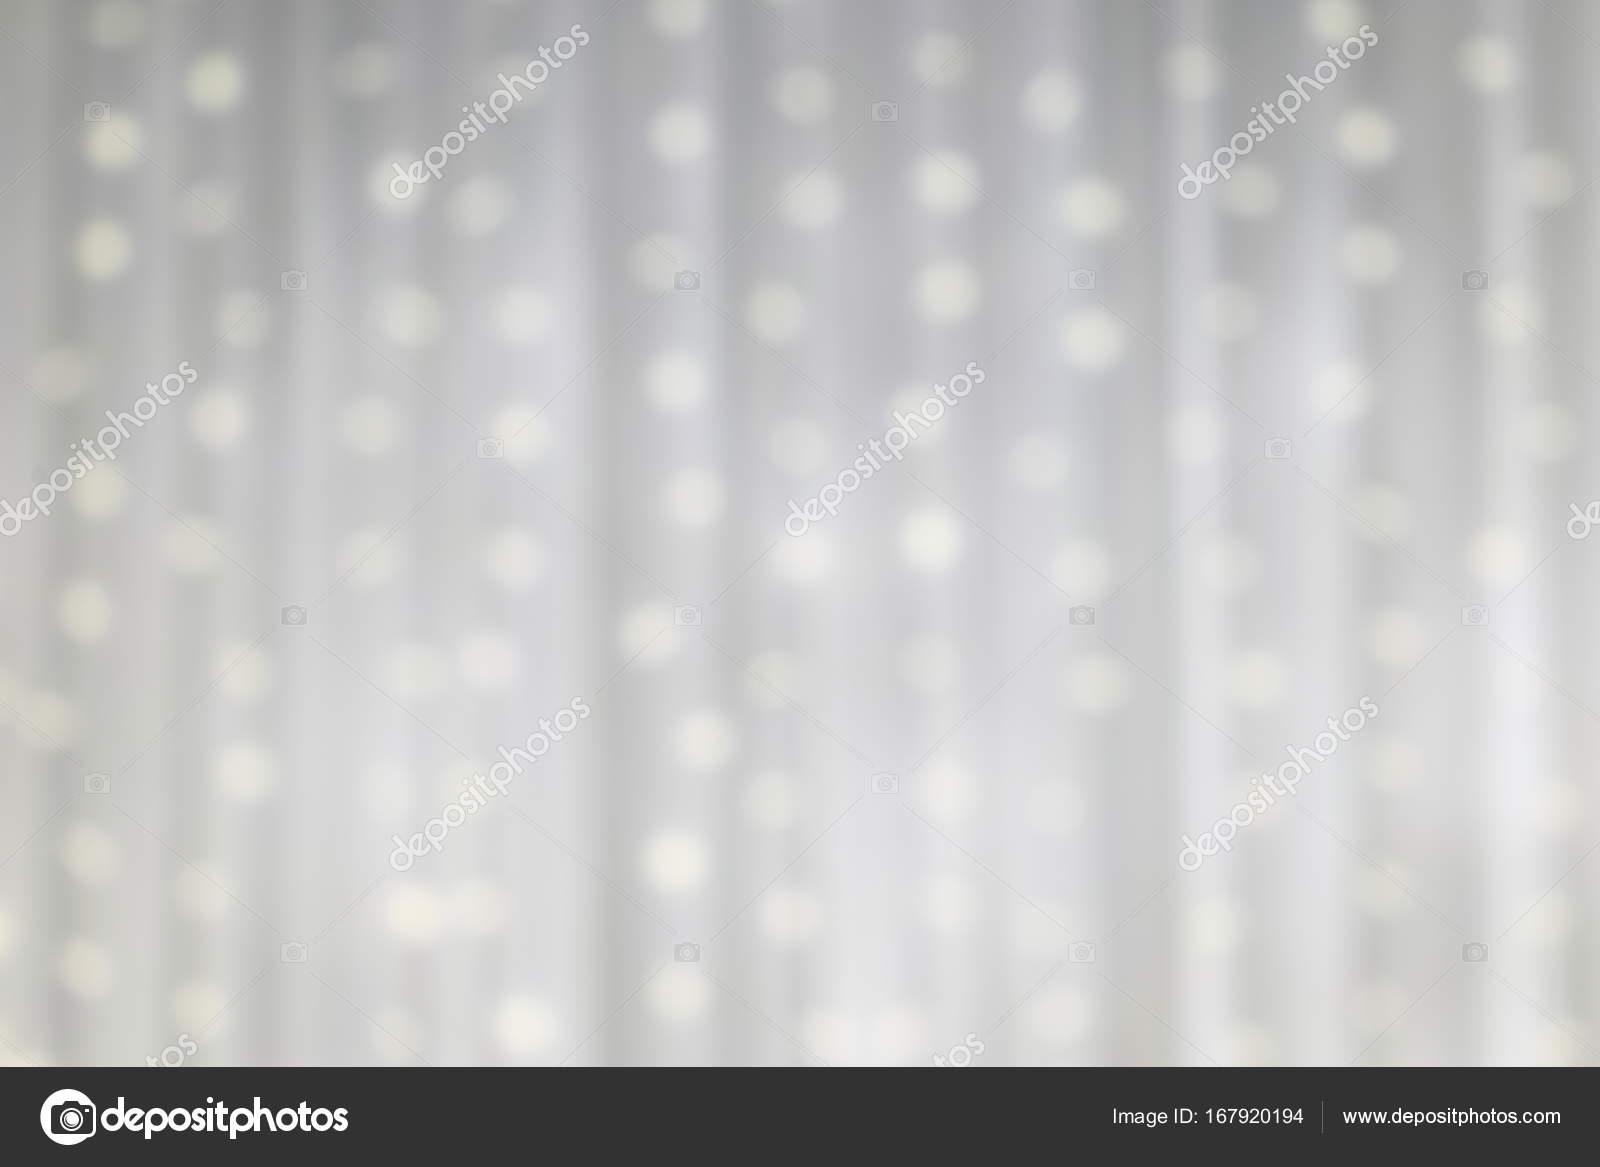 LED Light On White Cloth Curtain Backdrop Defocus Background Stock Photo